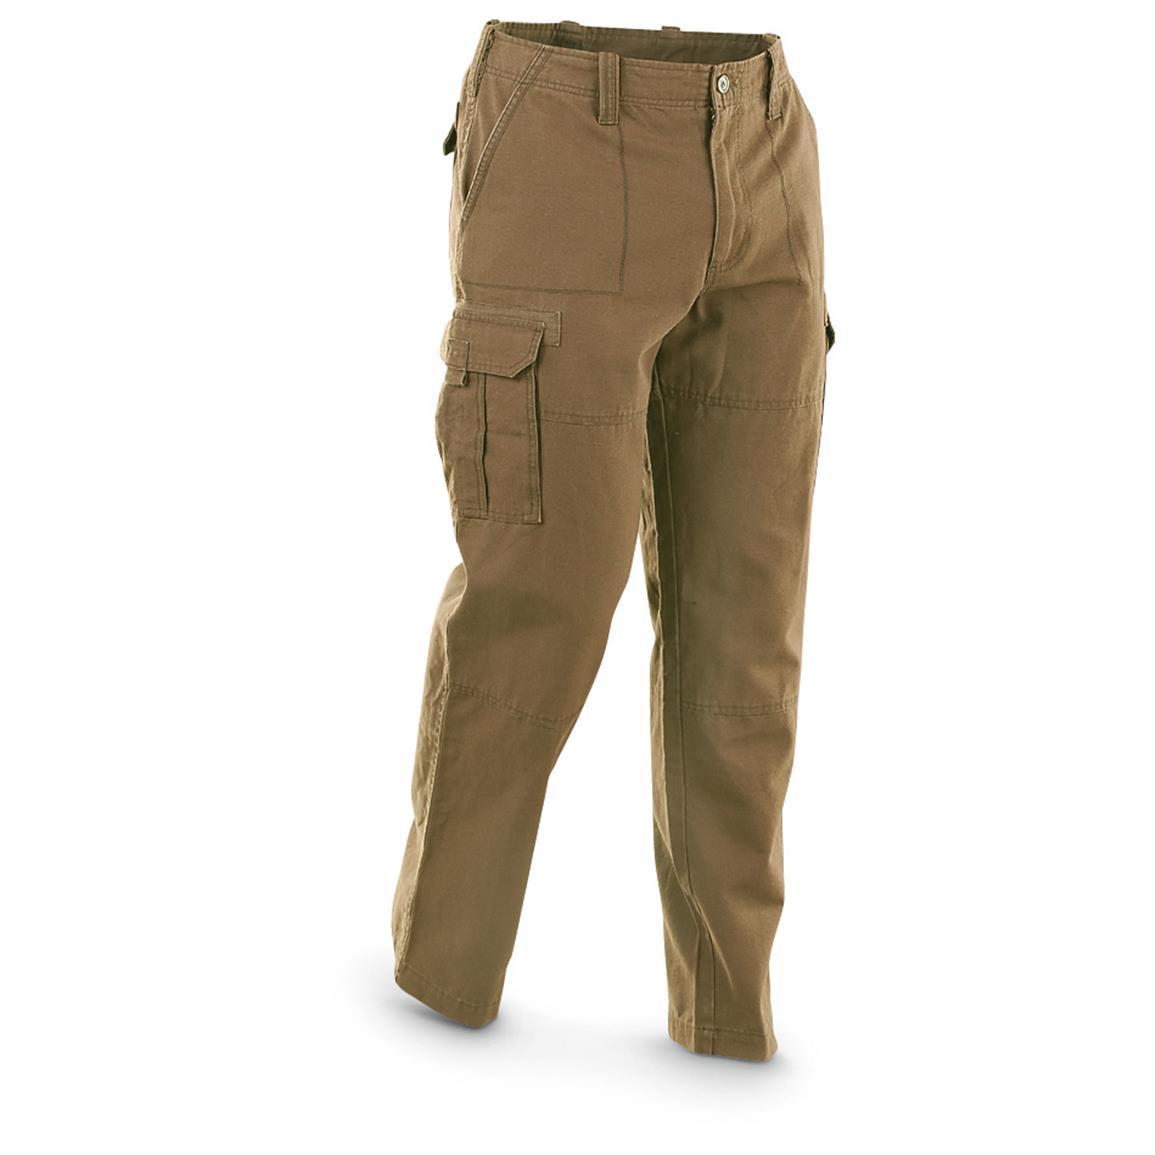 cargo jeans guide gear menu0027s cargo pants, british khaki fqbiafb